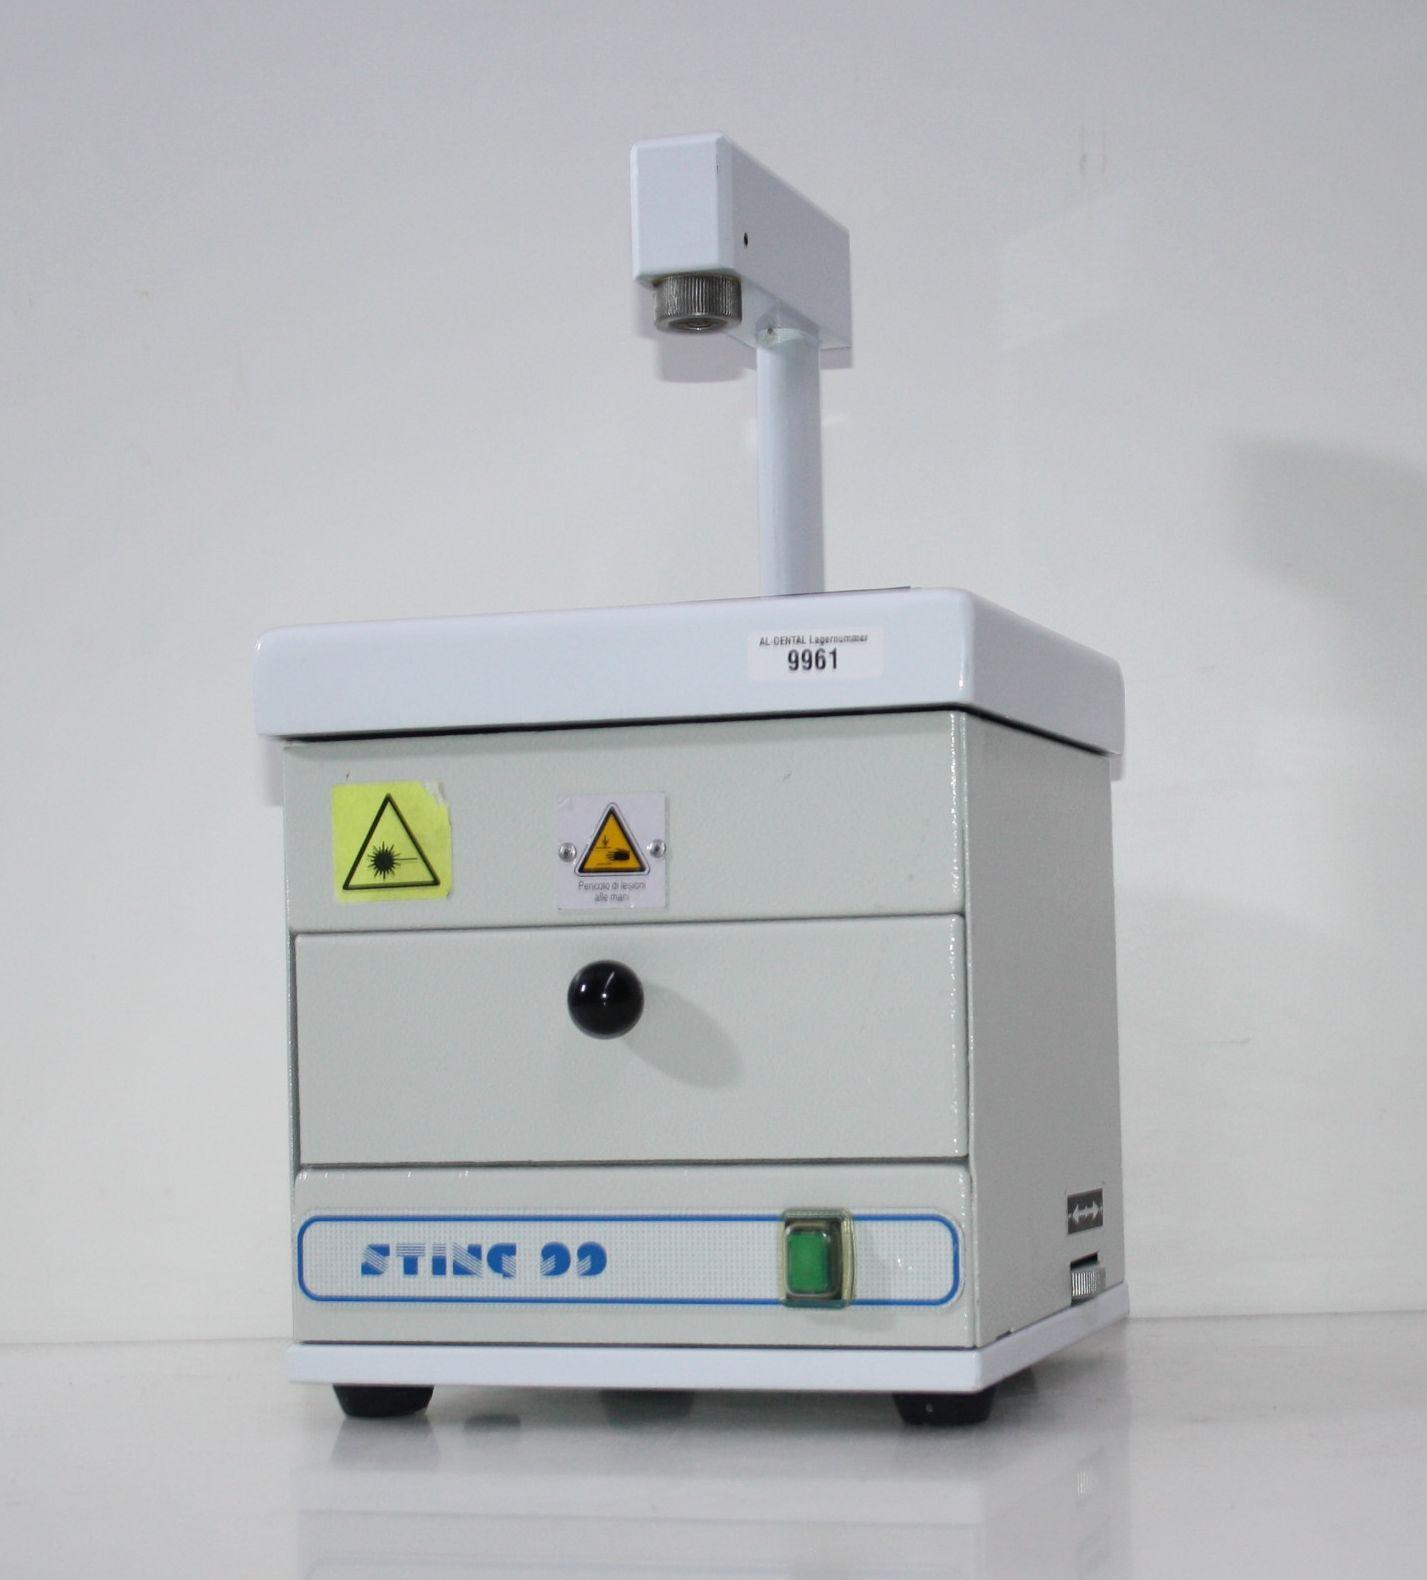 OMEC Laserpinbohrgerät Typ FG 99 # 9961